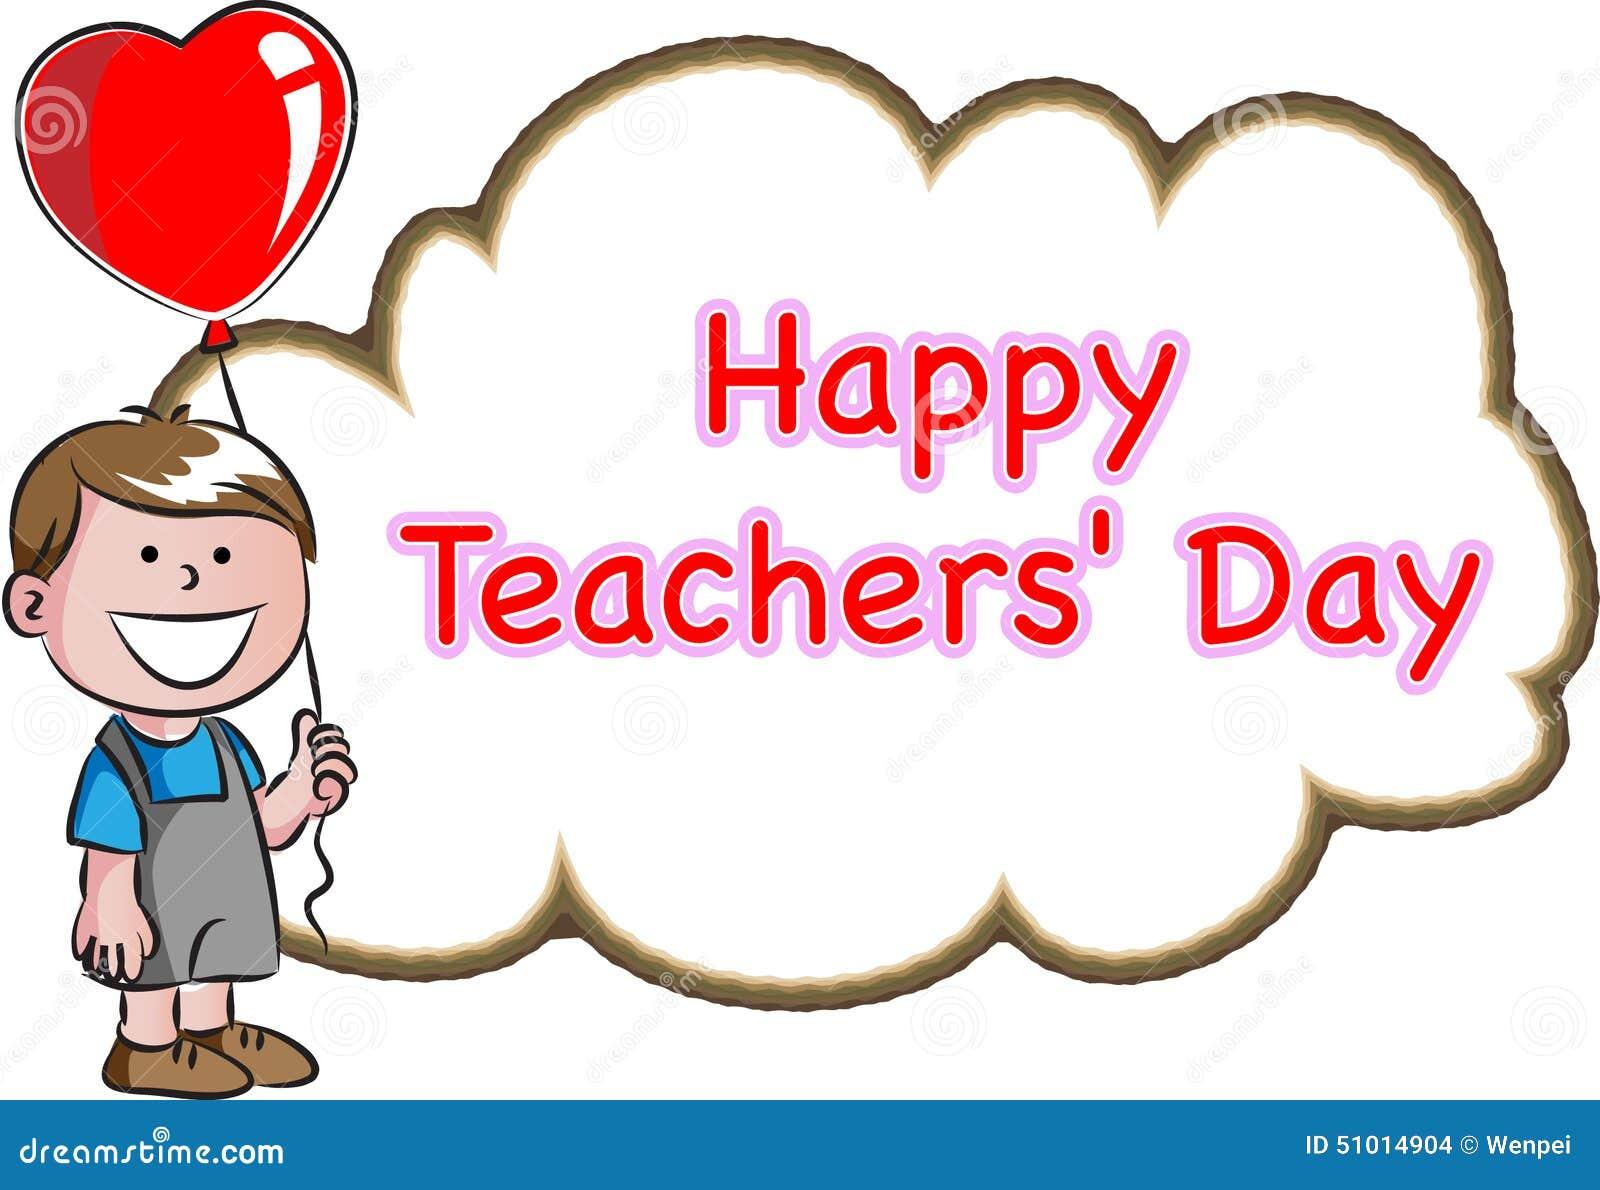 clipart teachers day - photo #15